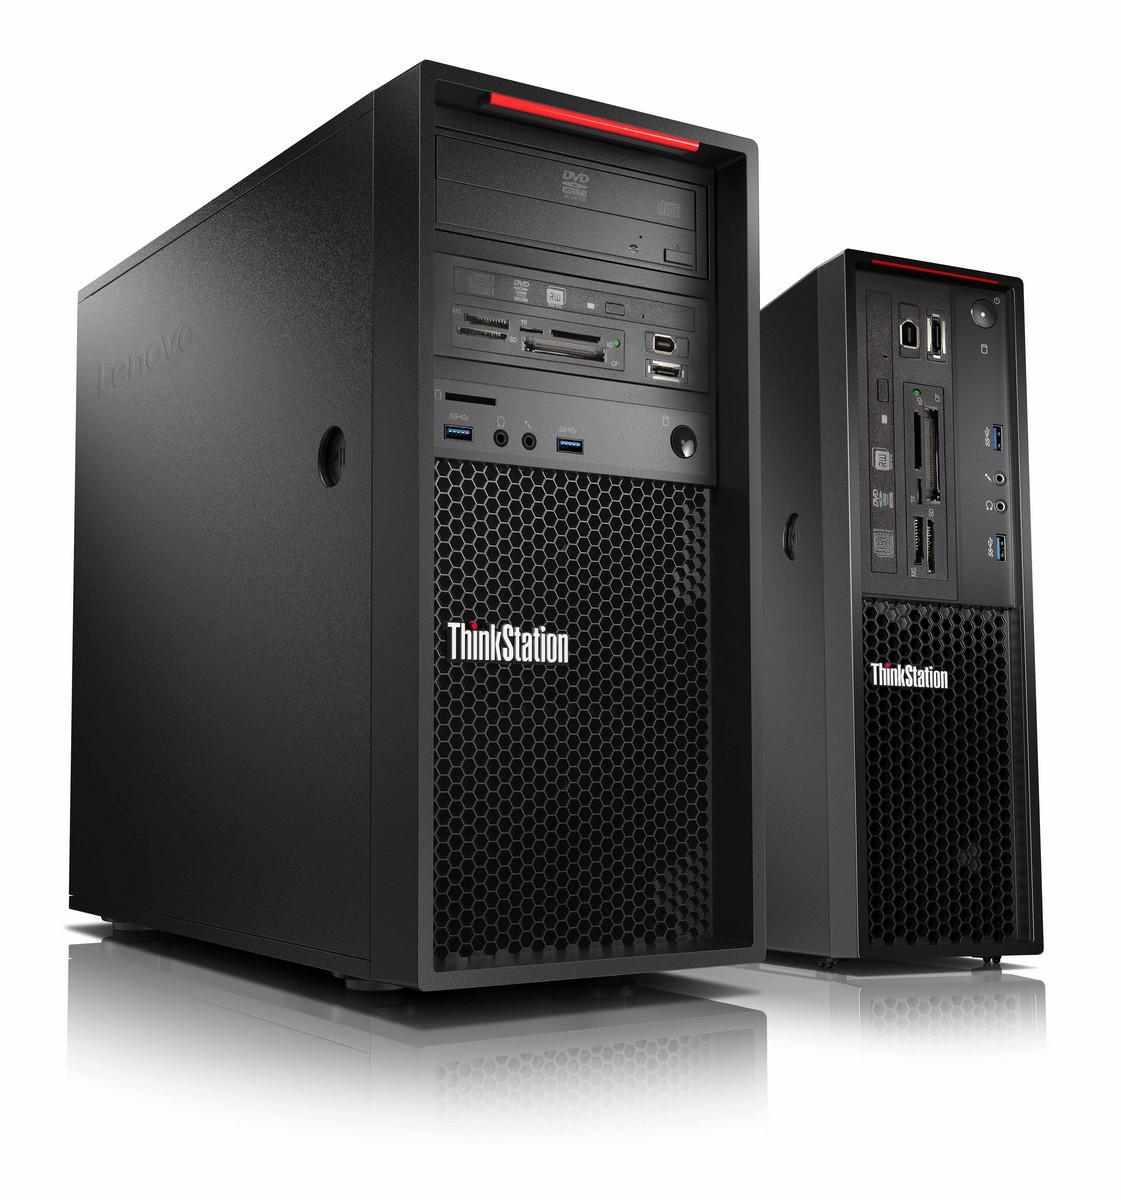 Lenovo Launching Vr Ready Thinkstation P320